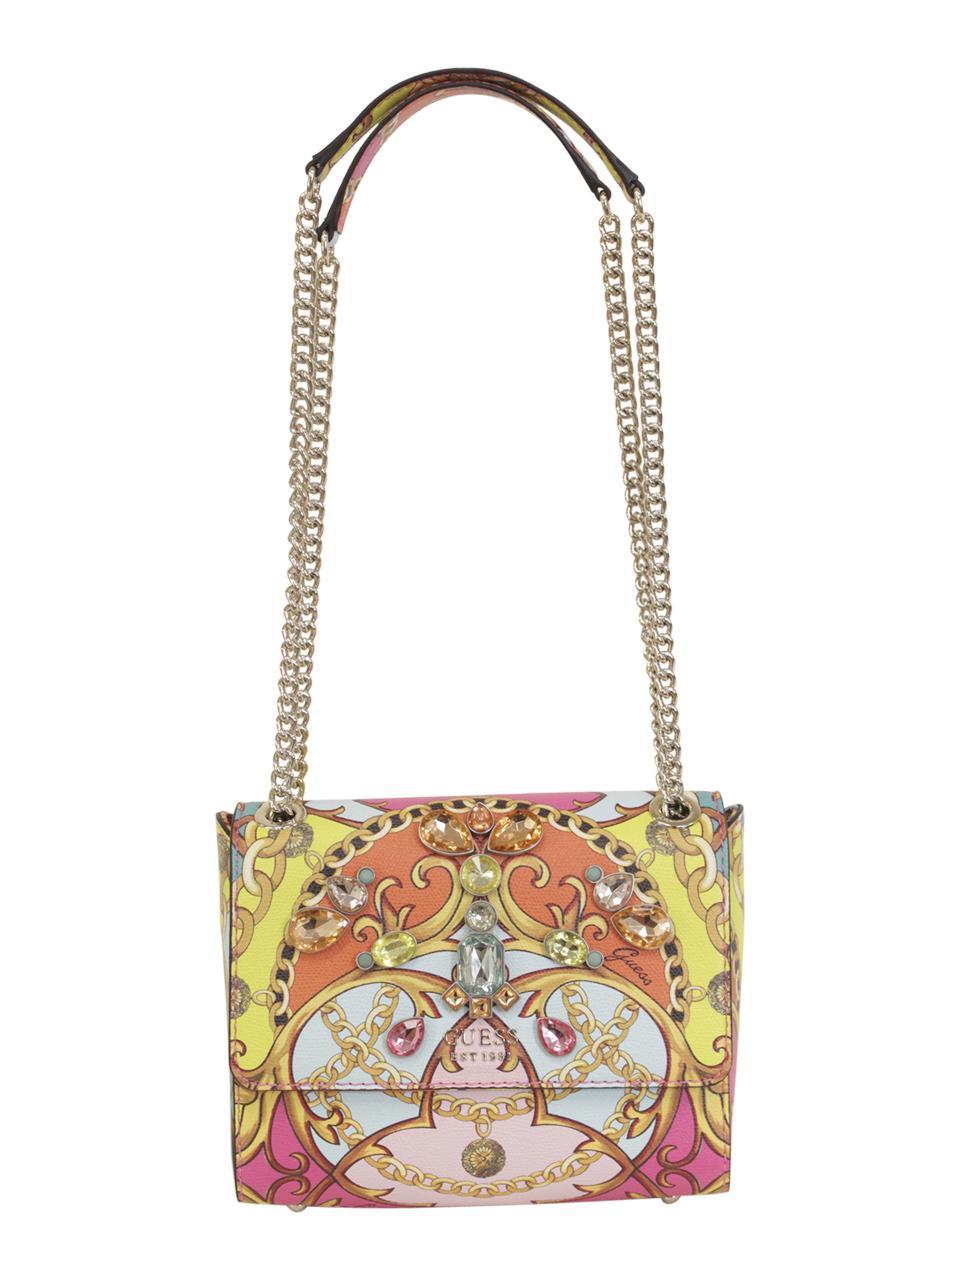 Guess Women's Jori Convertible Crossbody Handbag